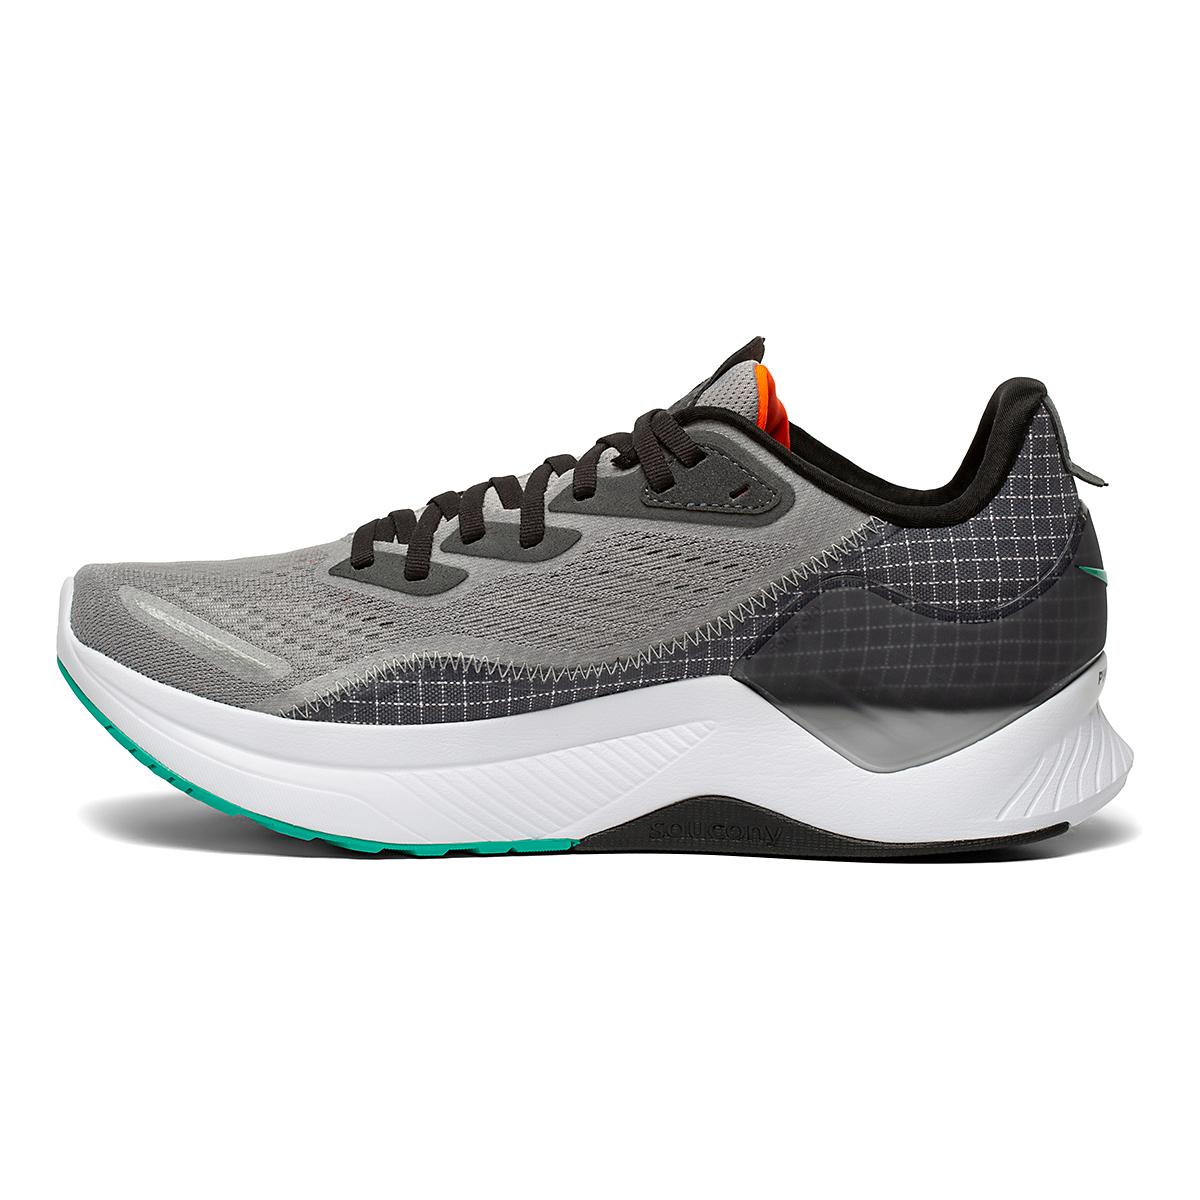 Men's Saucony Endorphin Shift 2 Running Shoe - Color: Alloy / Jade - Size: 7 - Width: Regular, Alloy / Jade, large, image 2